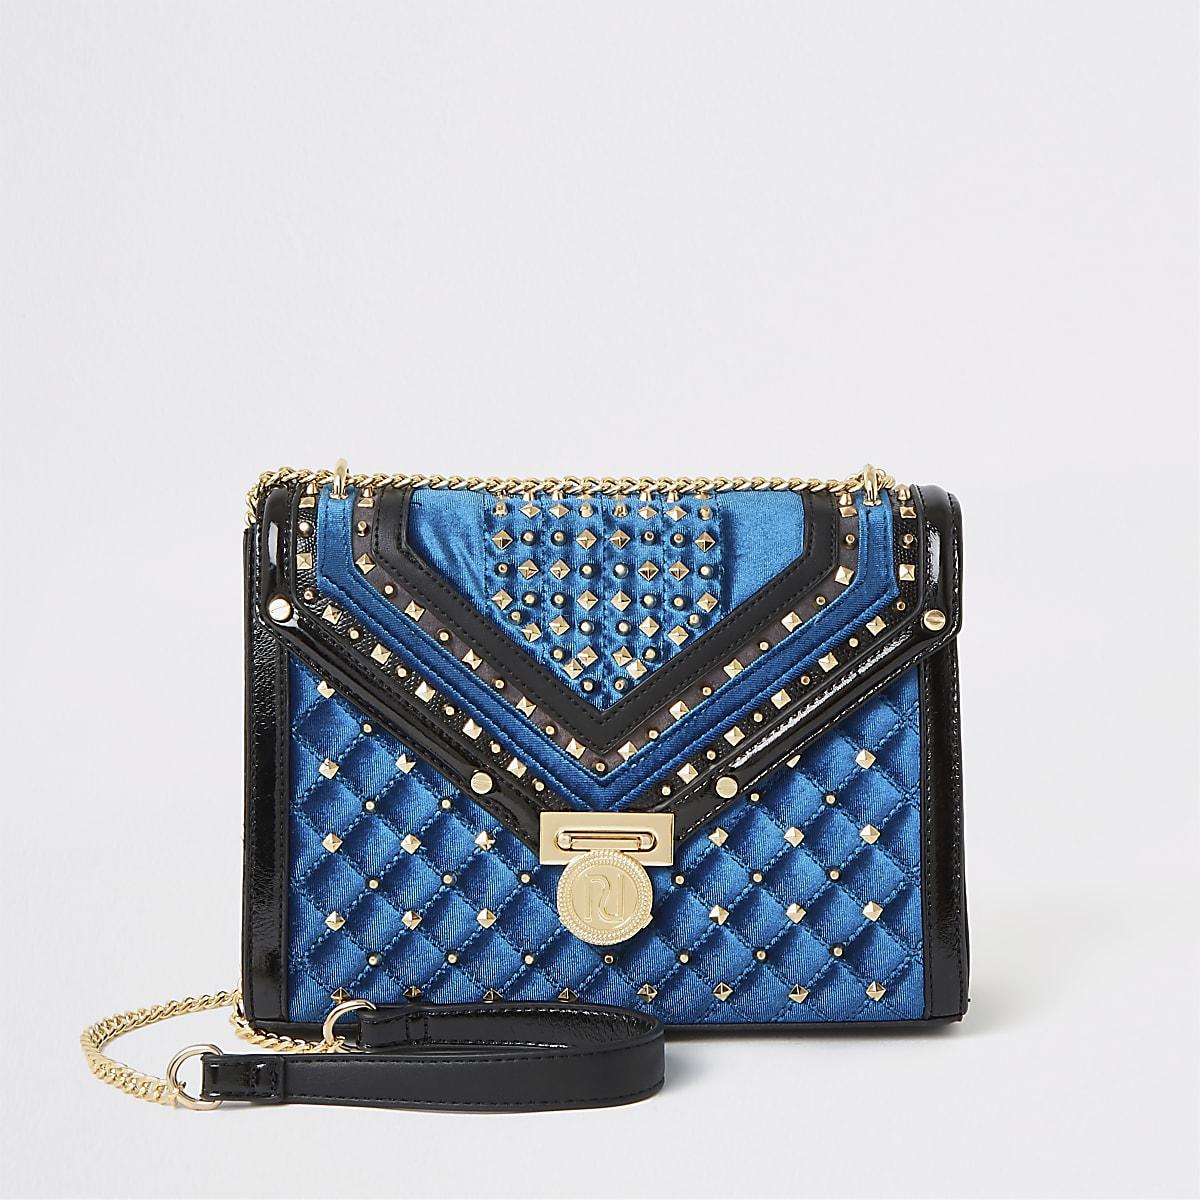 Marineblauwe doorgestikte crossbodytas met studs